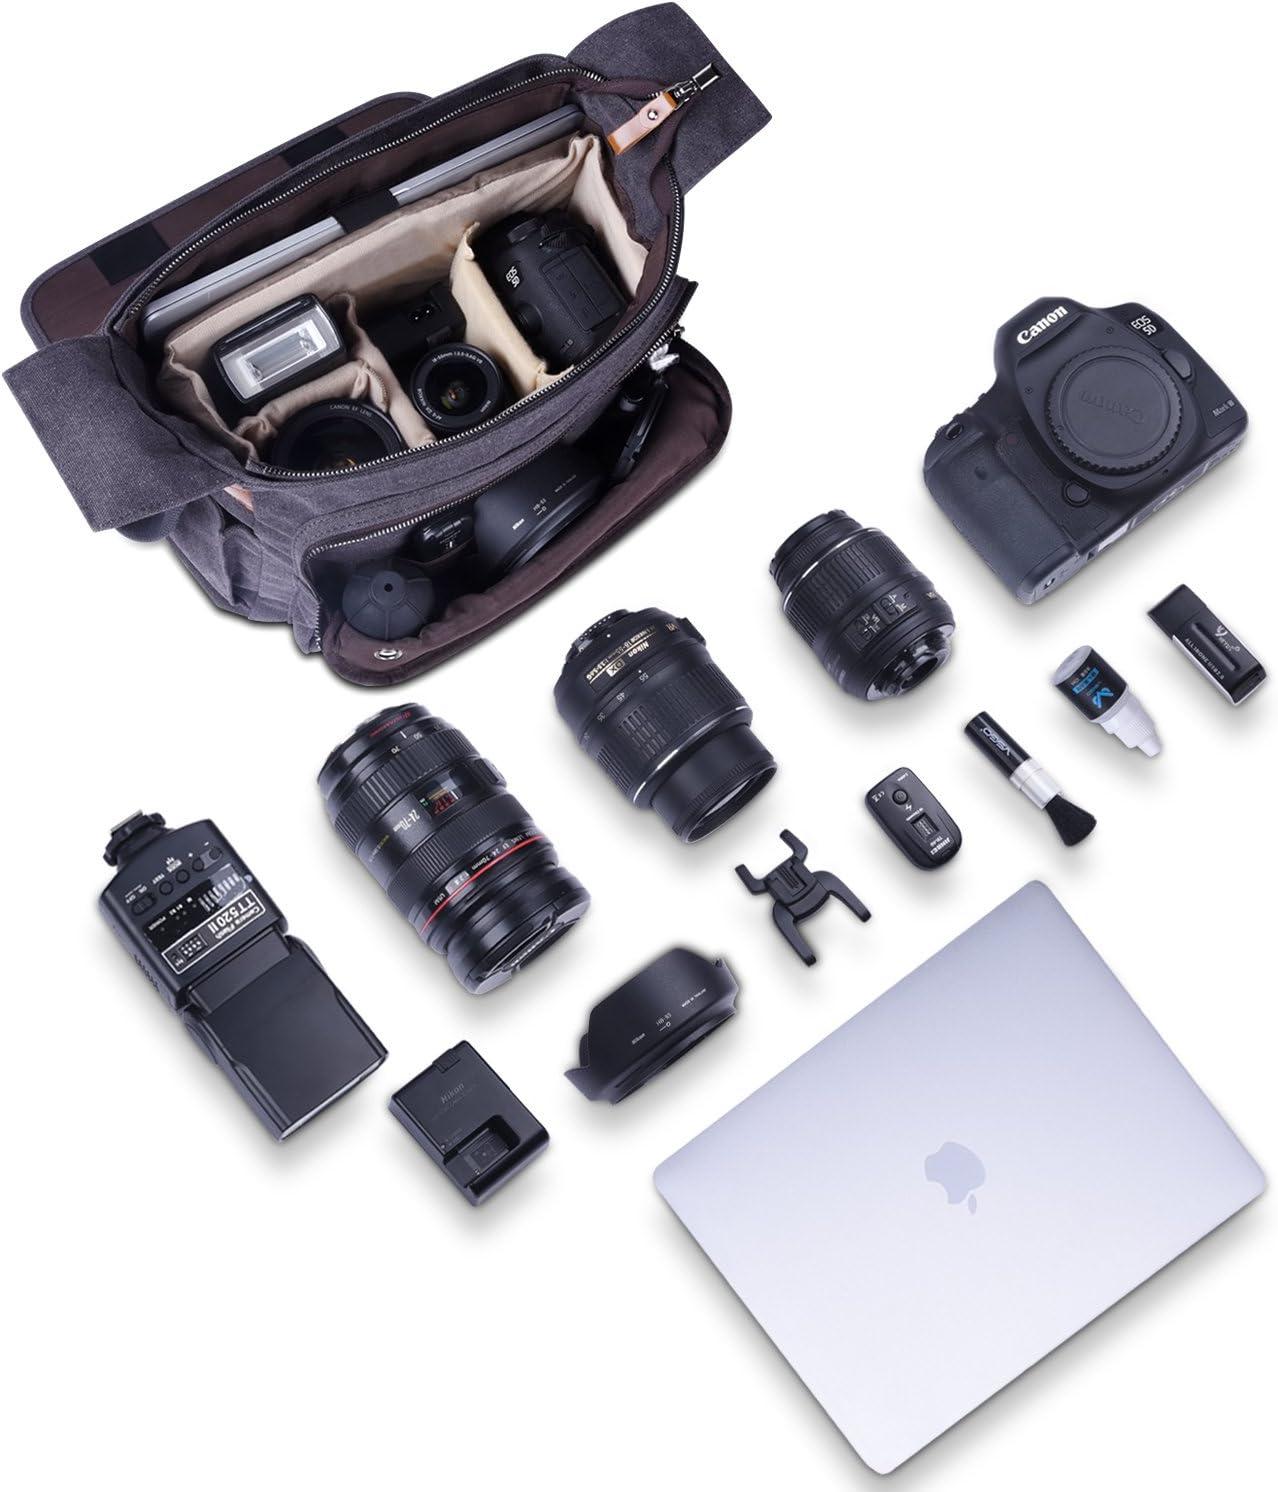 Estarer Kameratasche Fototasche SLR//DSLR//Spiegelreflex Kamera Umh?ngetasche aus Wasserabweisend Canvas 15,6 Zoll//14 Zoll Grau 14 Zoll